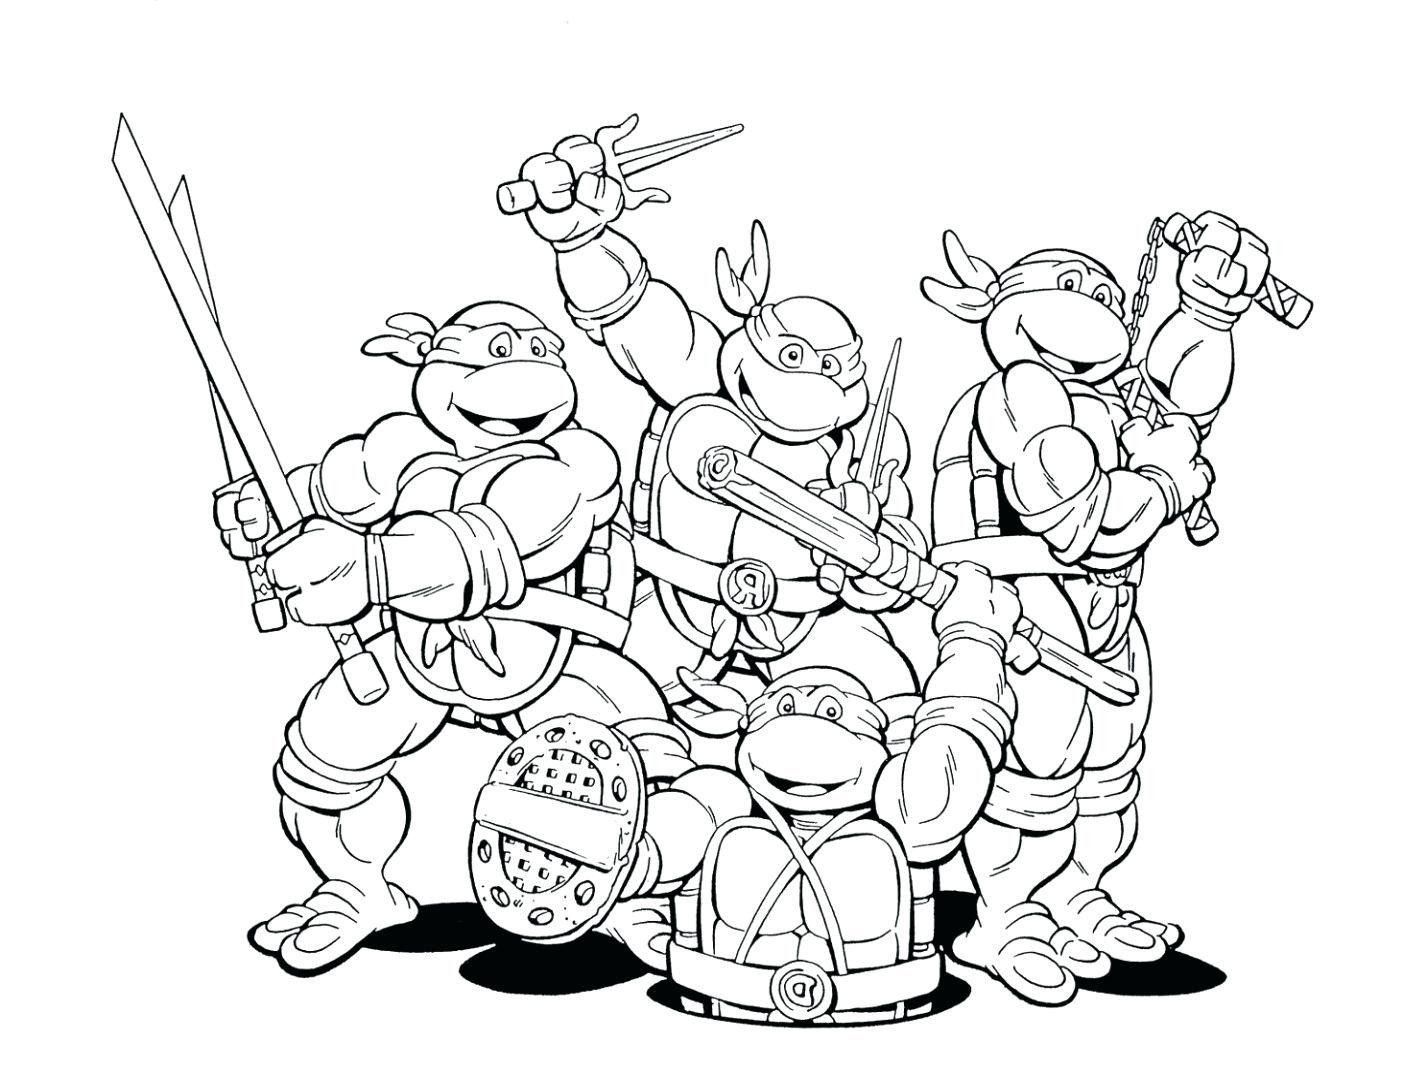 Ninja Turtles Coloring Pages Fresh Teenage Mutant Ninja Turtles Coloring Pages Nickelo Turtle Coloring Pages Cartoon Coloring Pages Ninja Turtle Coloring Pages